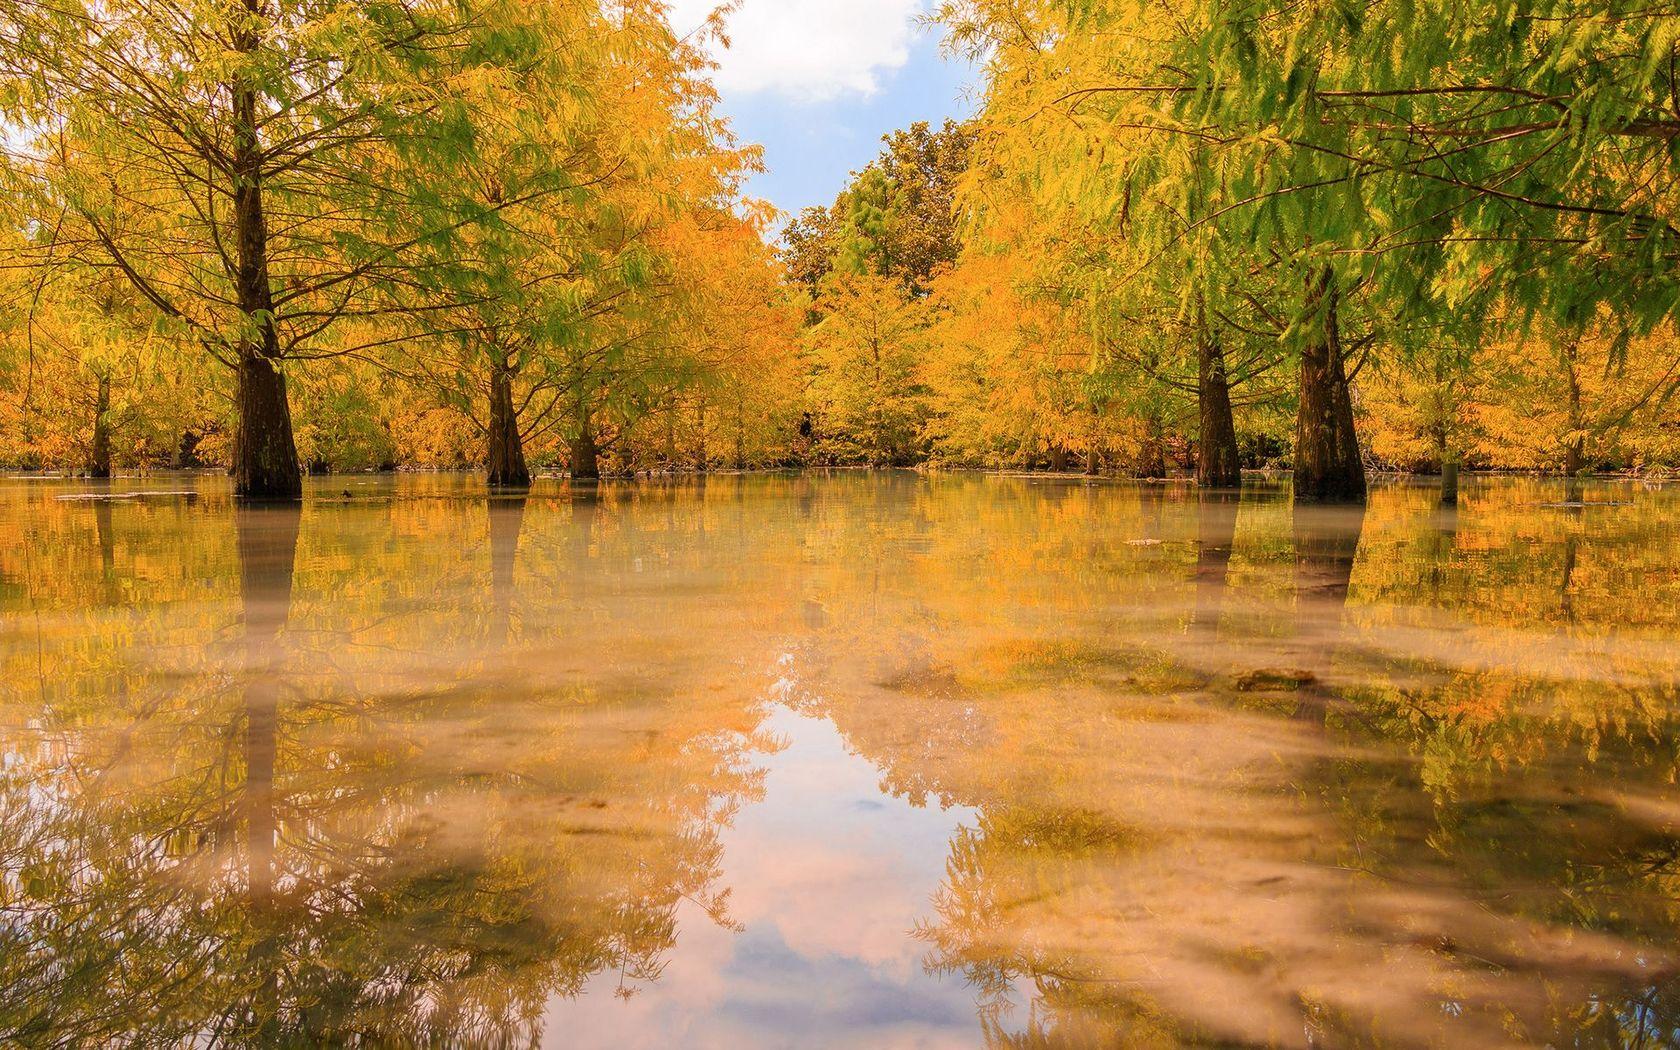 Free Fall Wallpaper With Animals Swamp Wallpaper Autumn Fall Hd Desktop Wallpapers 4k Hd